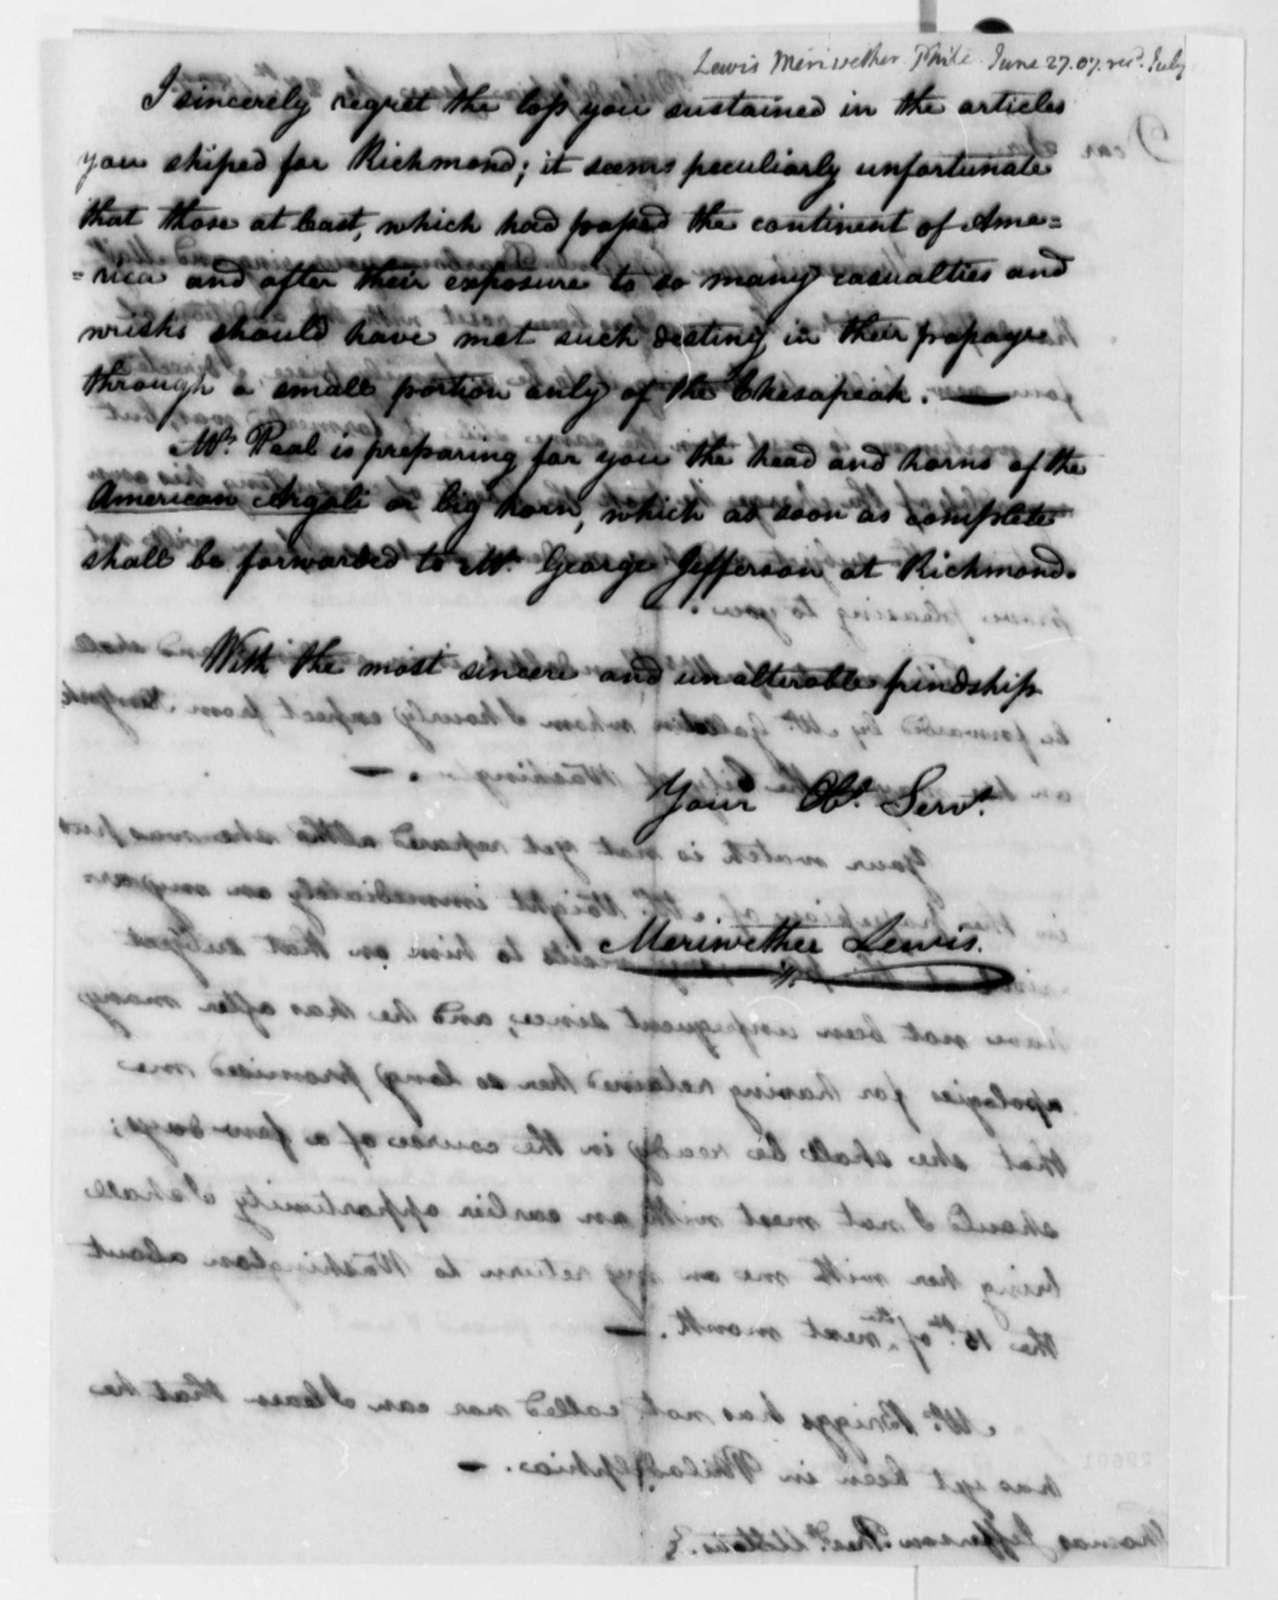 Meriwether Lewis to Thomas Jefferson, June 27, 1807